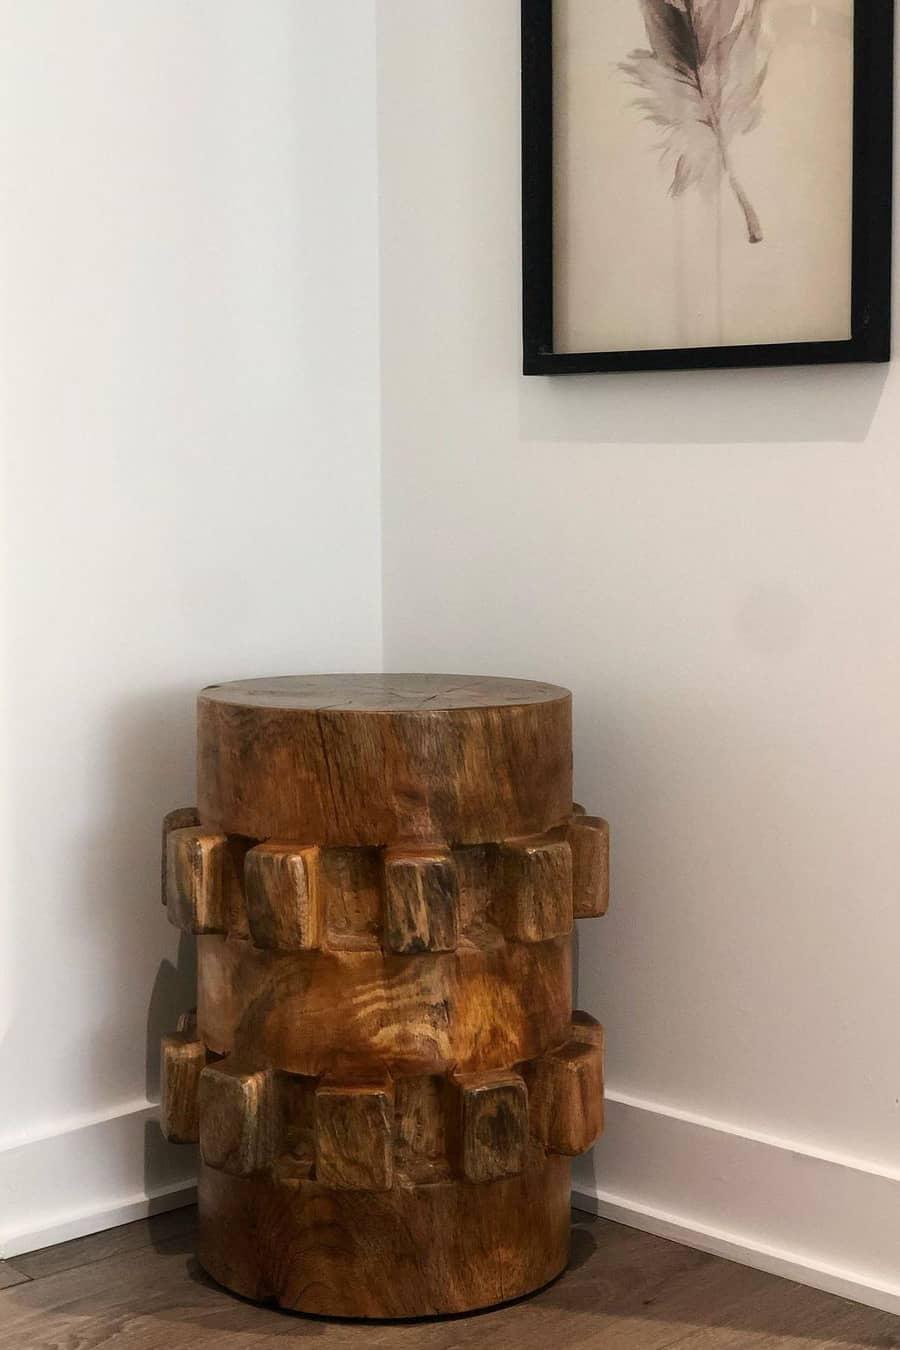 Creative stool